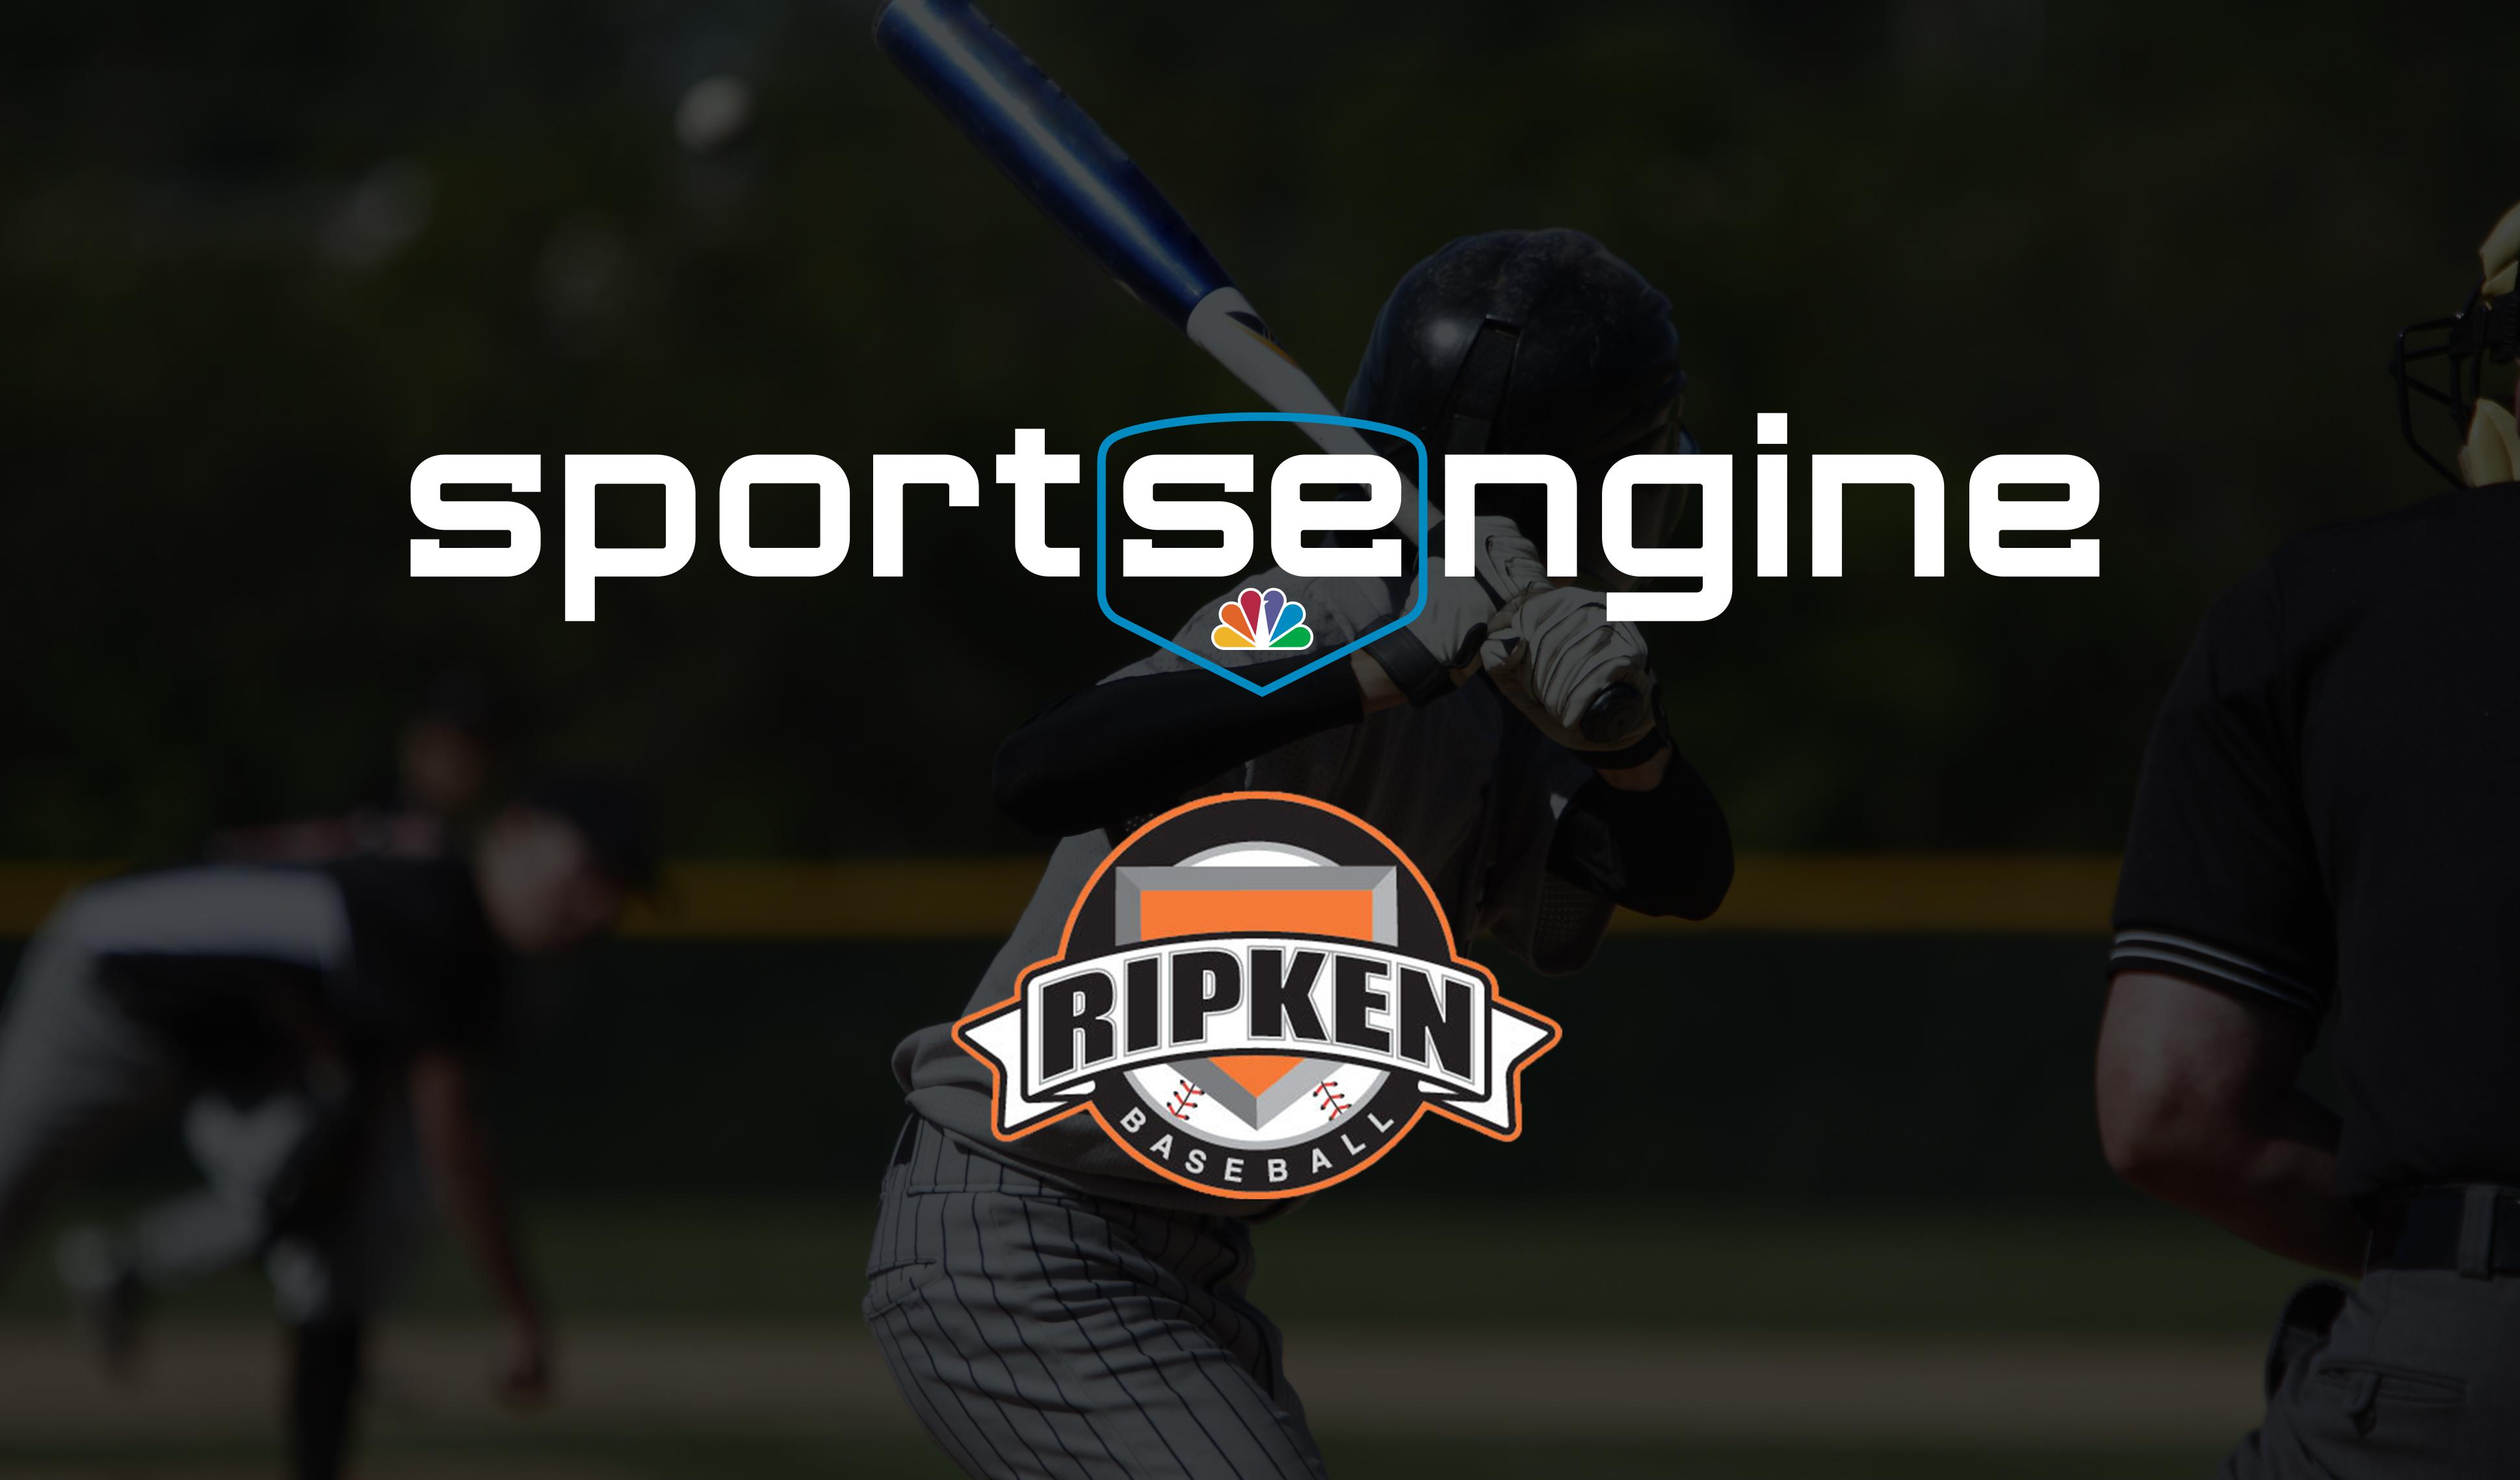 SportsEngine Enhances Ripken Baseball Digital Experience